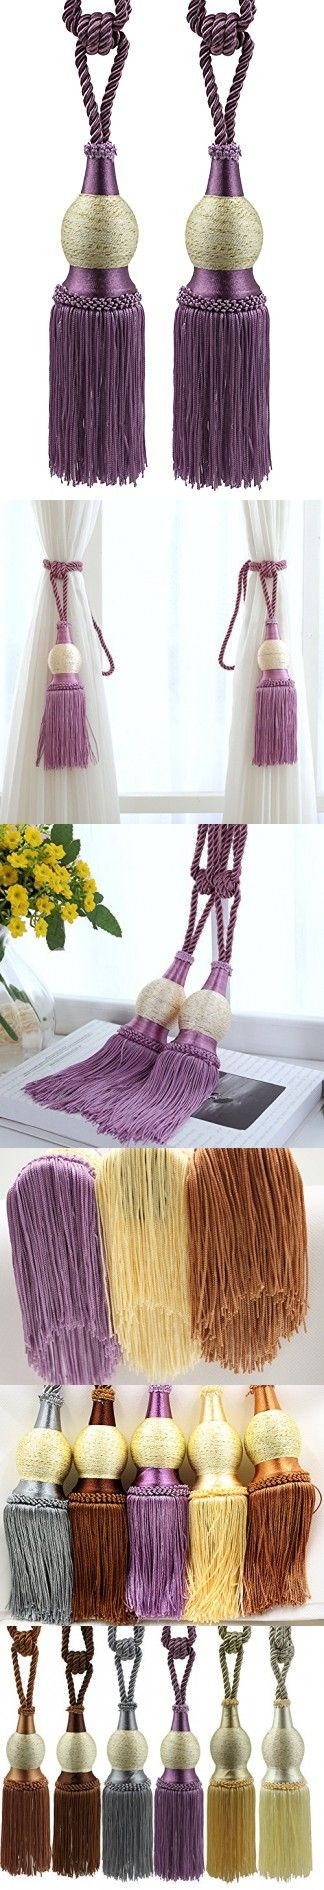 Kisstaker 1 Pair Window Curtain TieBacks Knitted Braided Curtain Cord Home Decor Window Treatments Purple